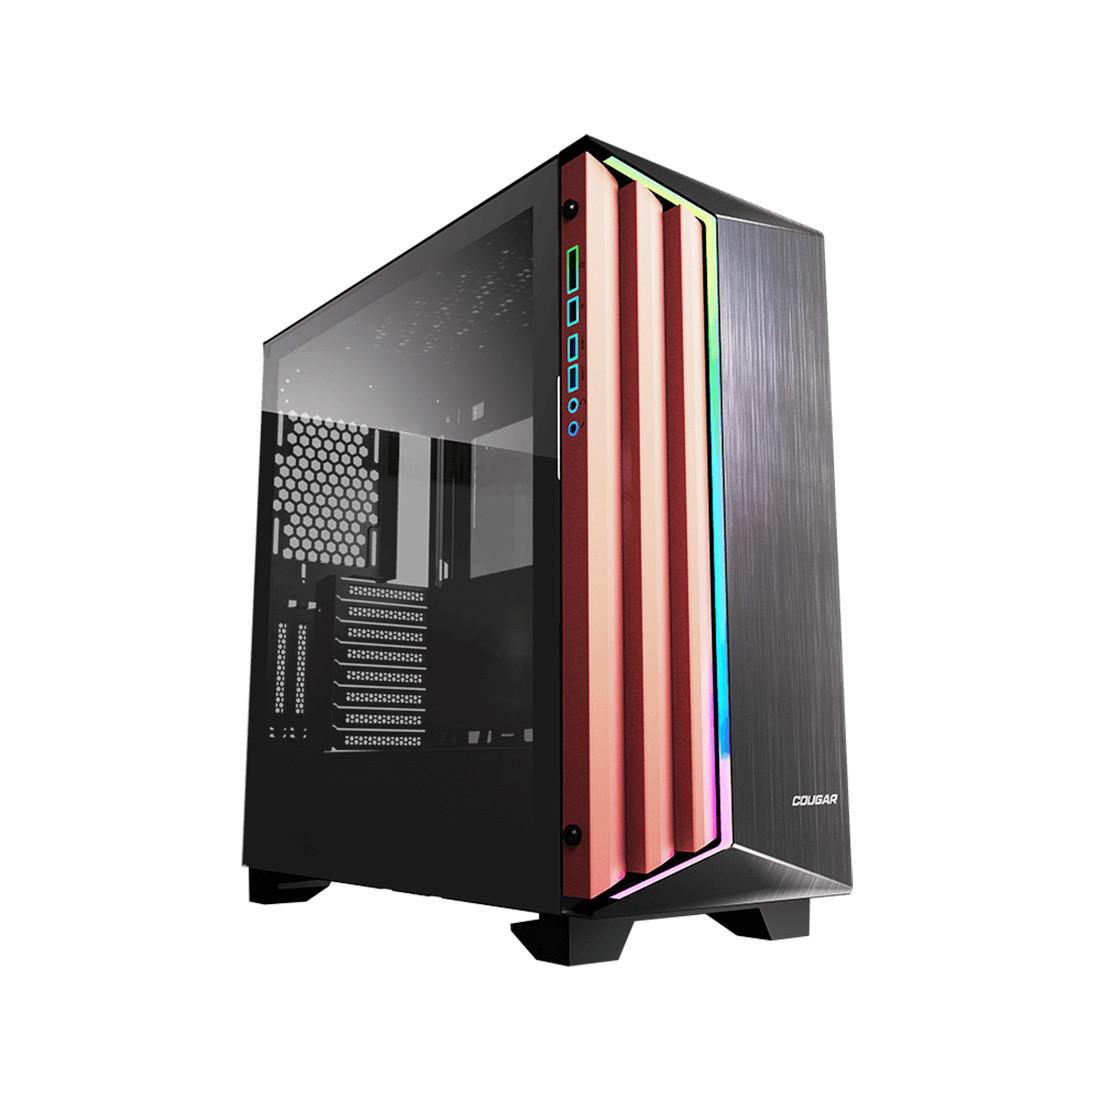 Компьютерный корпус Cougar Dark Blader-S